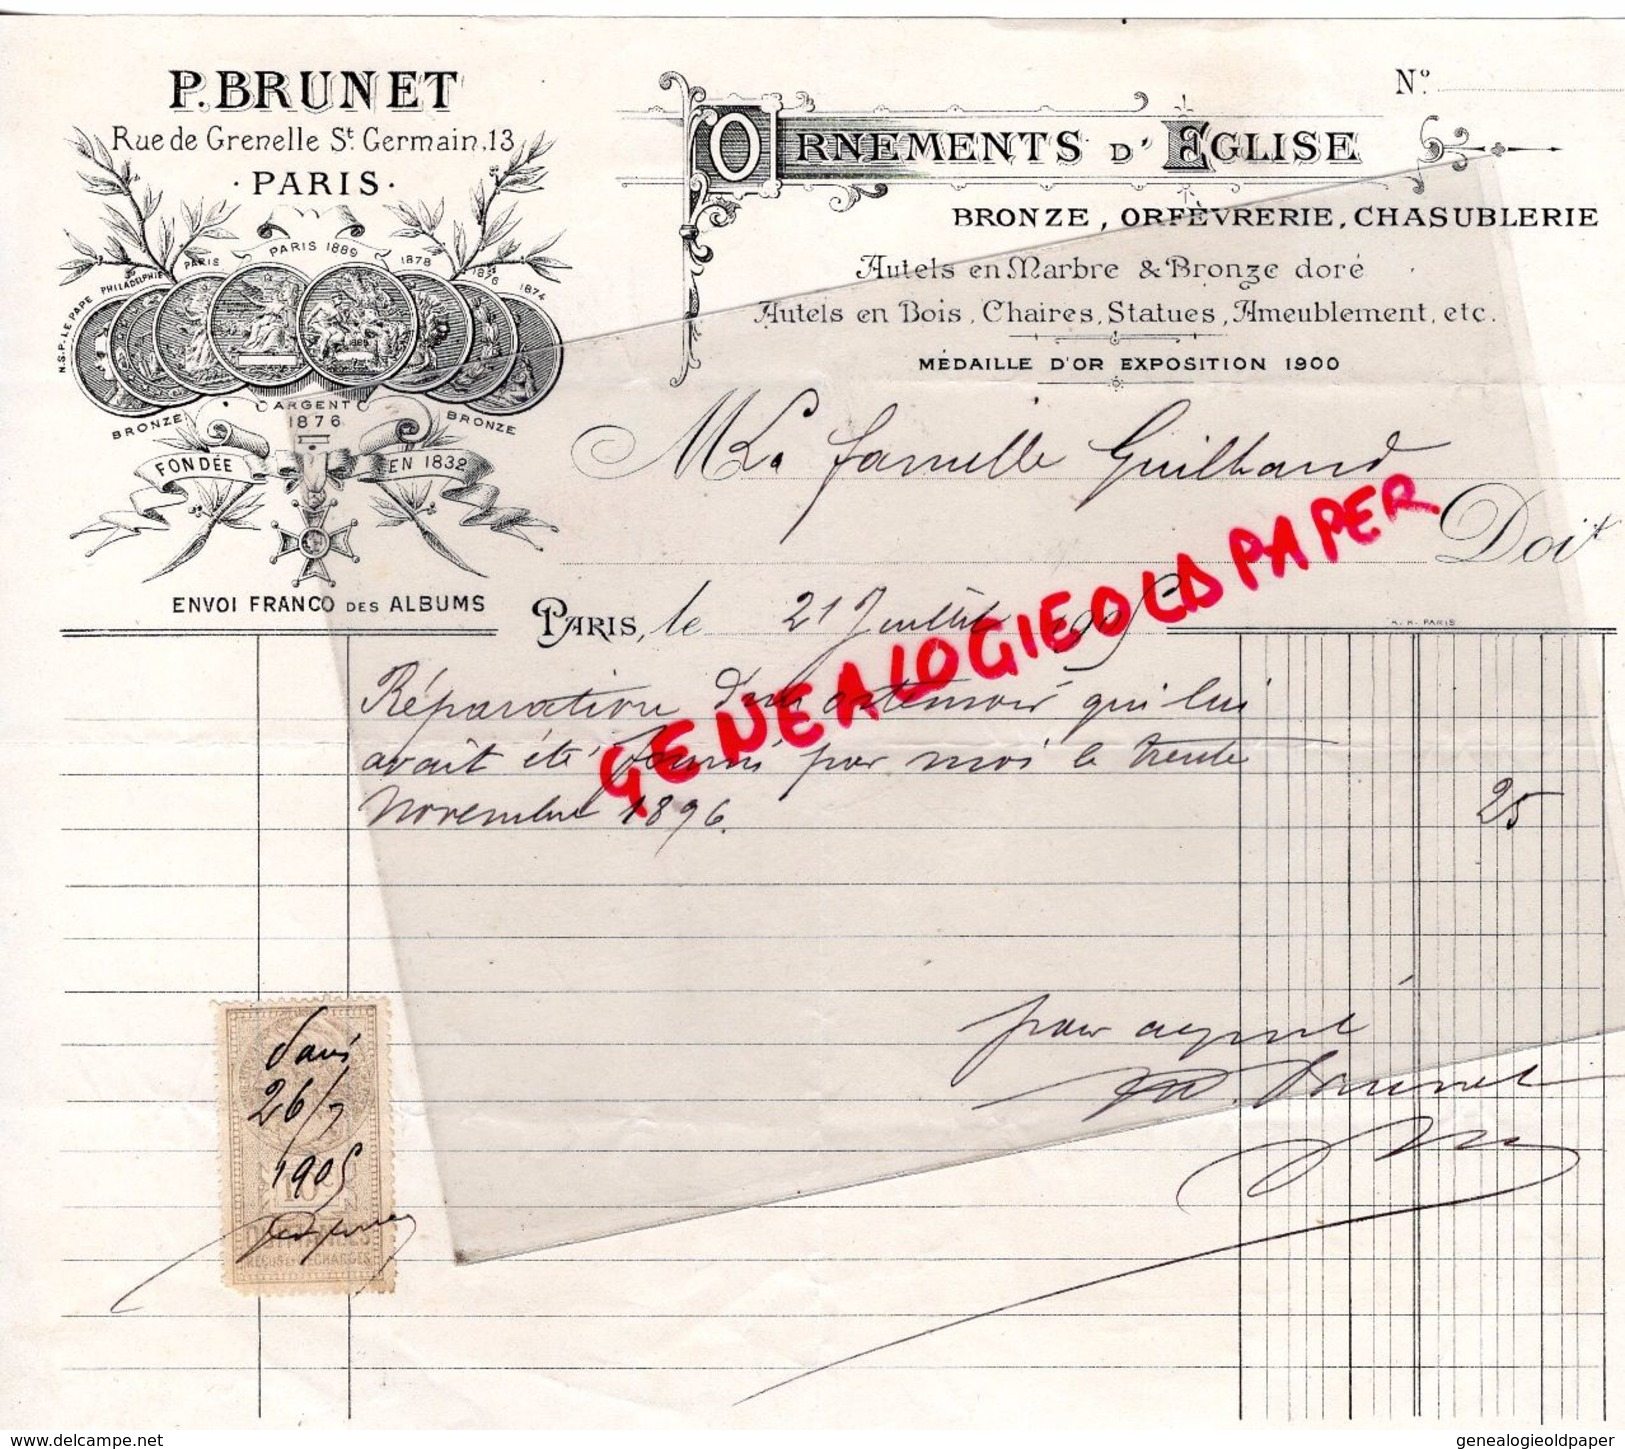 75- PARIS- FACTURE P. PRUNET-OEEMENTS EGLISE-ORFEVRERIE CHASUBLERIE-BRONZE-13 RUE GRENELLE ST GERMAIN-1905 - Old Professions